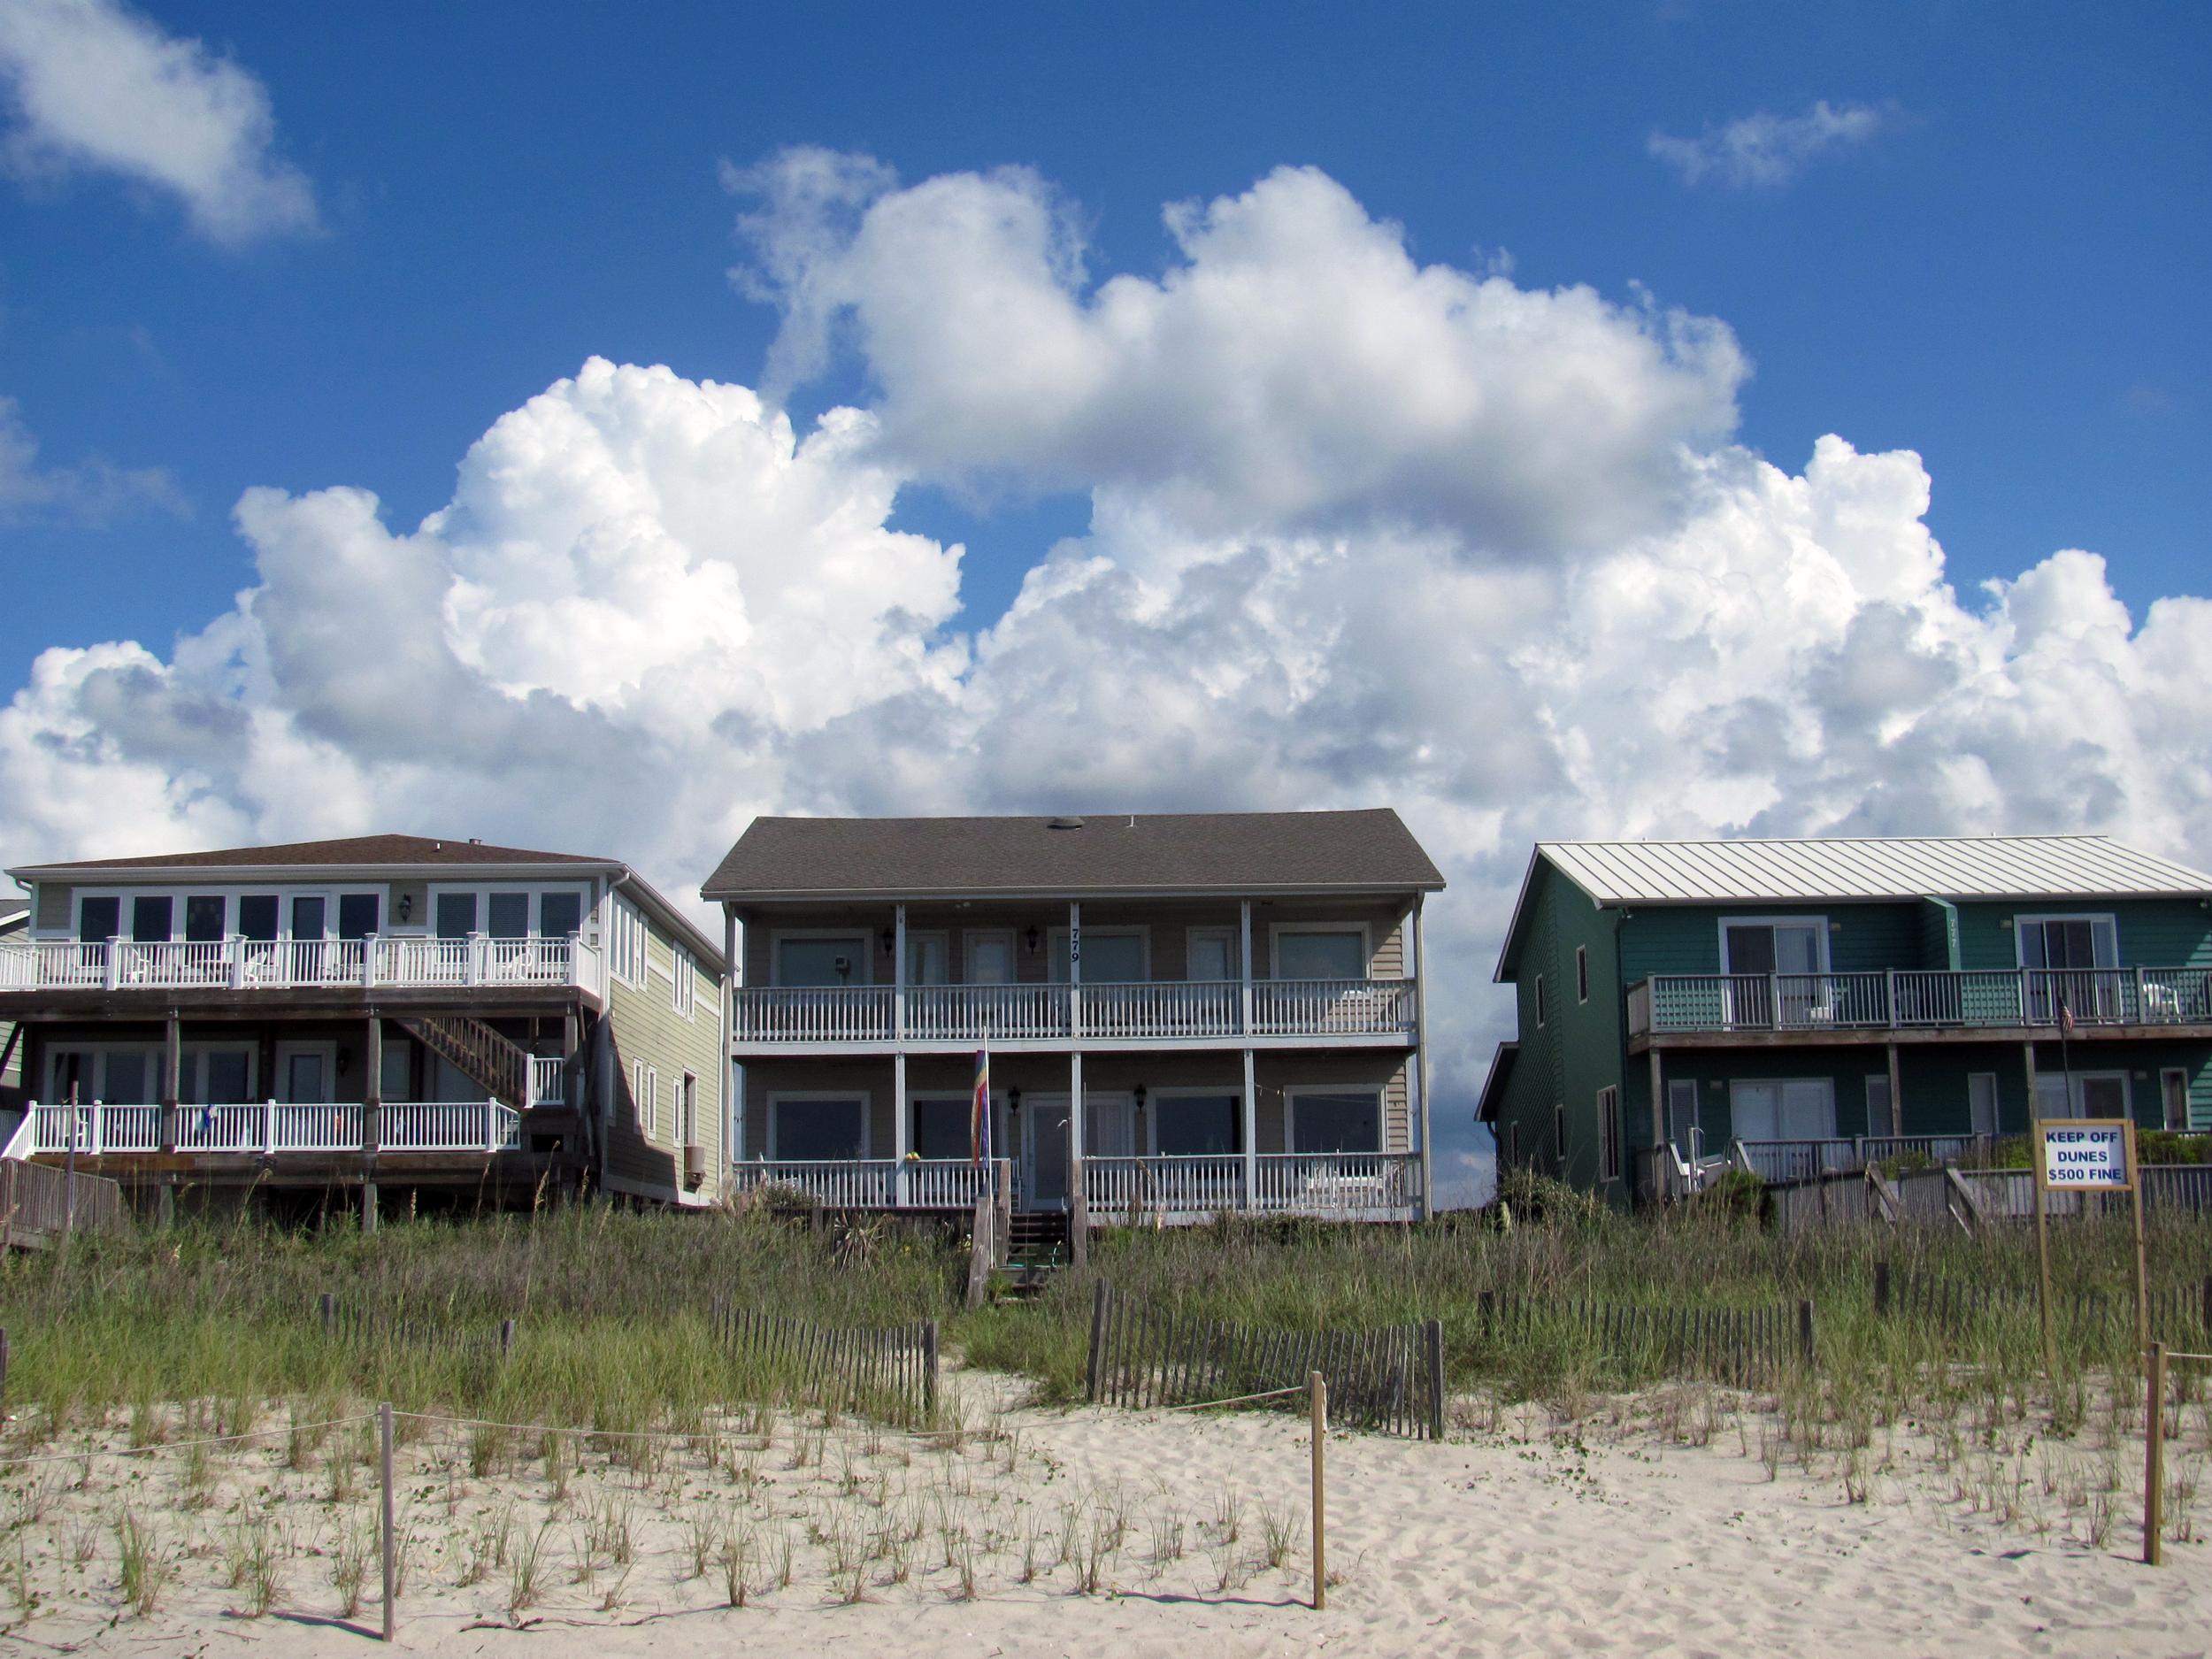 Holden Beach, August 2011